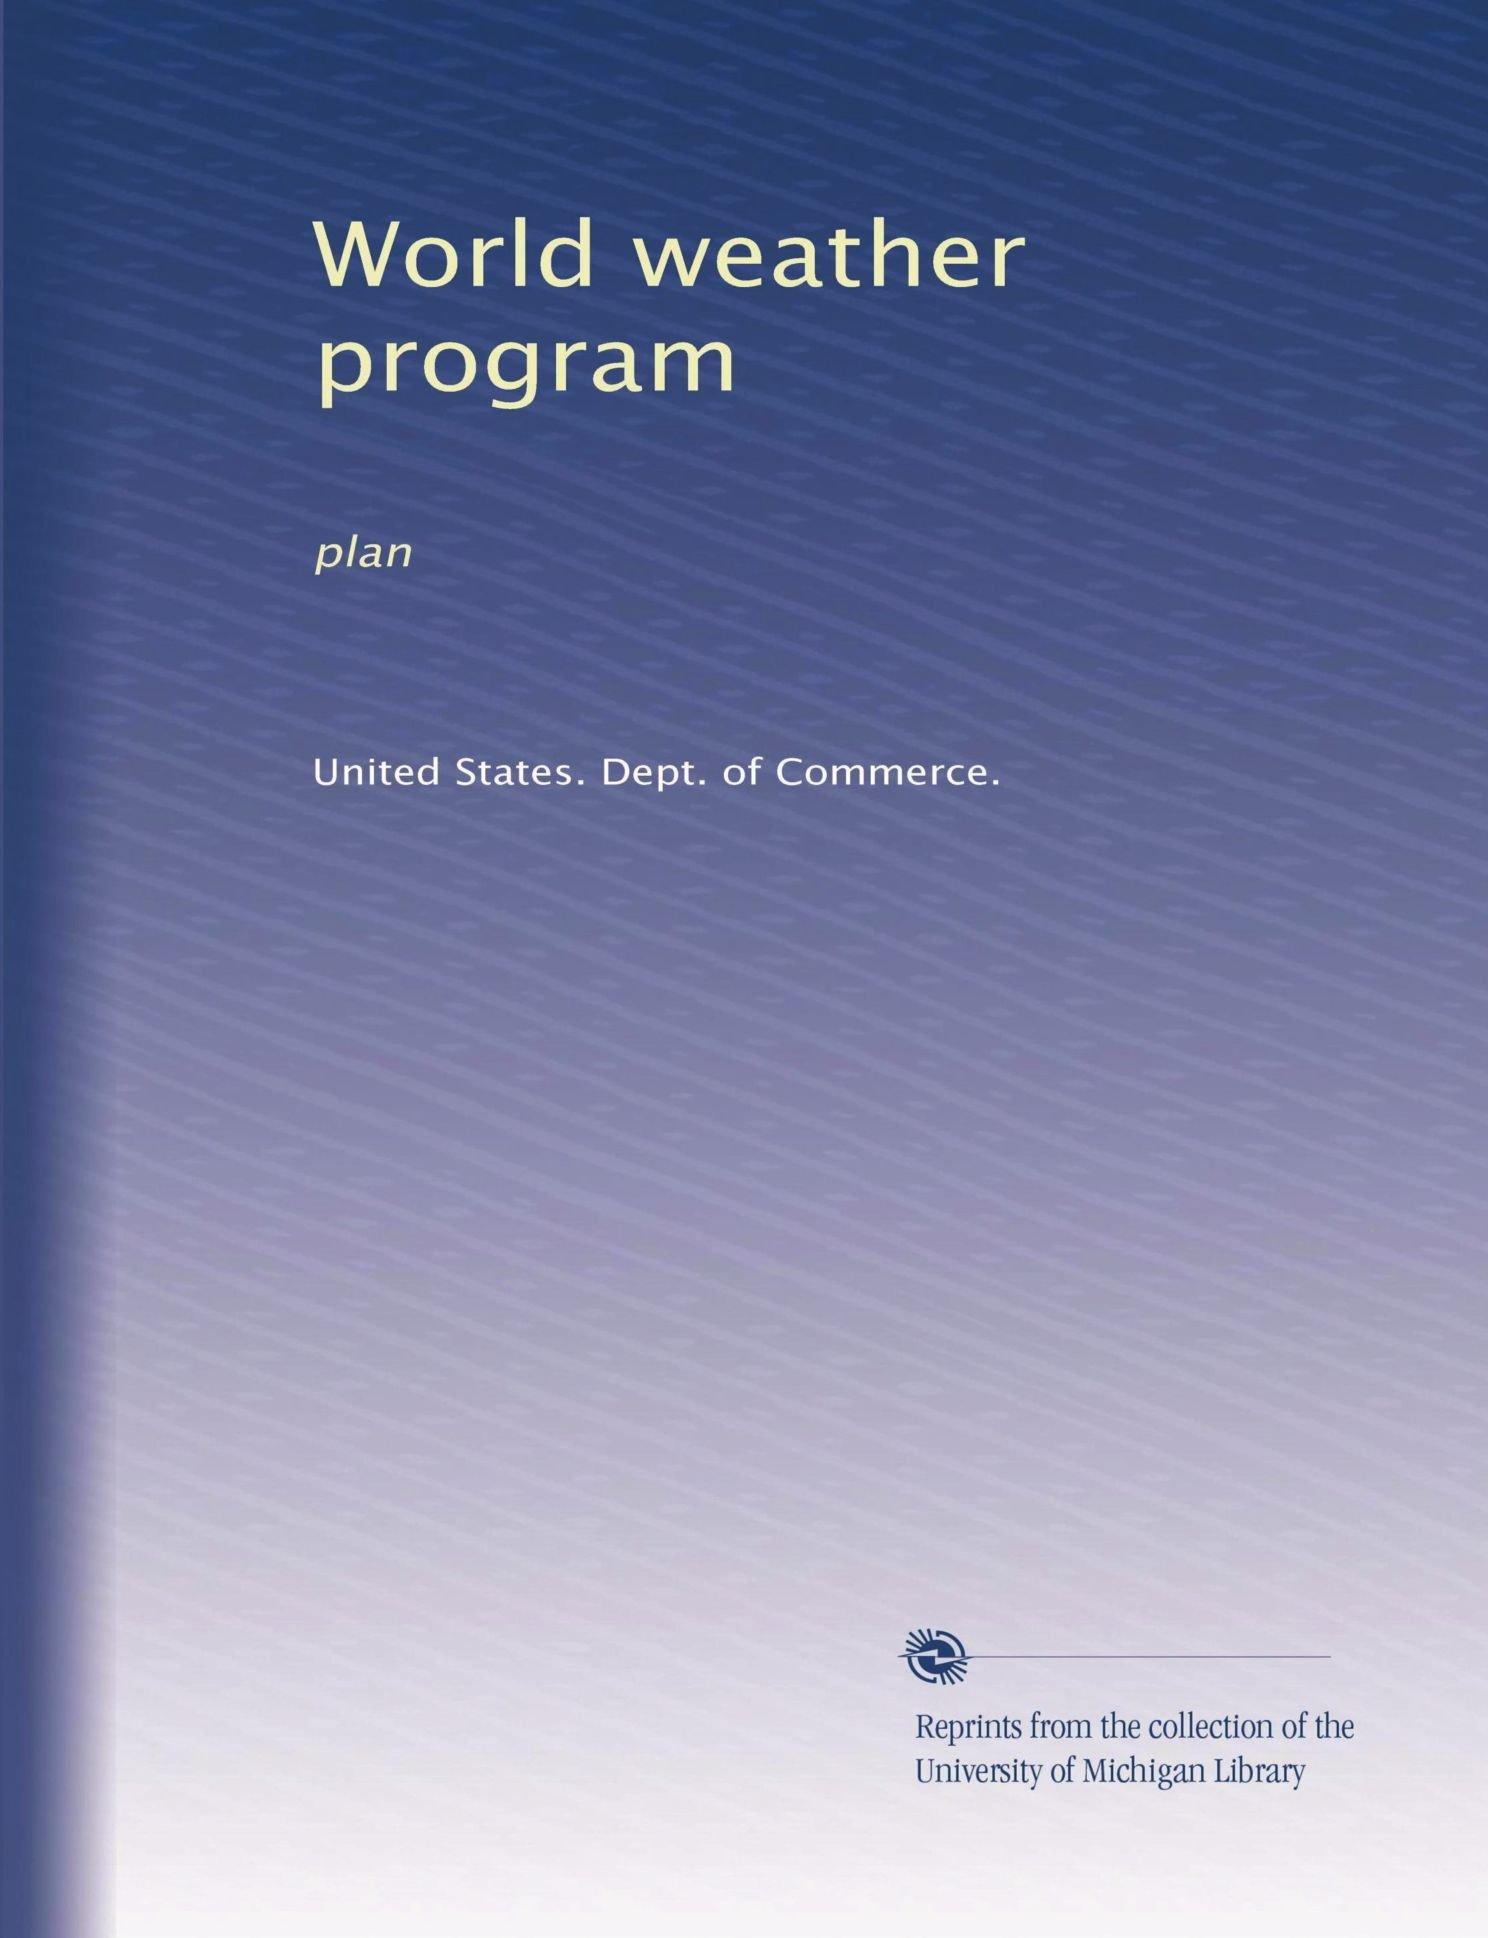 Download World weather program: plan PDF ePub book